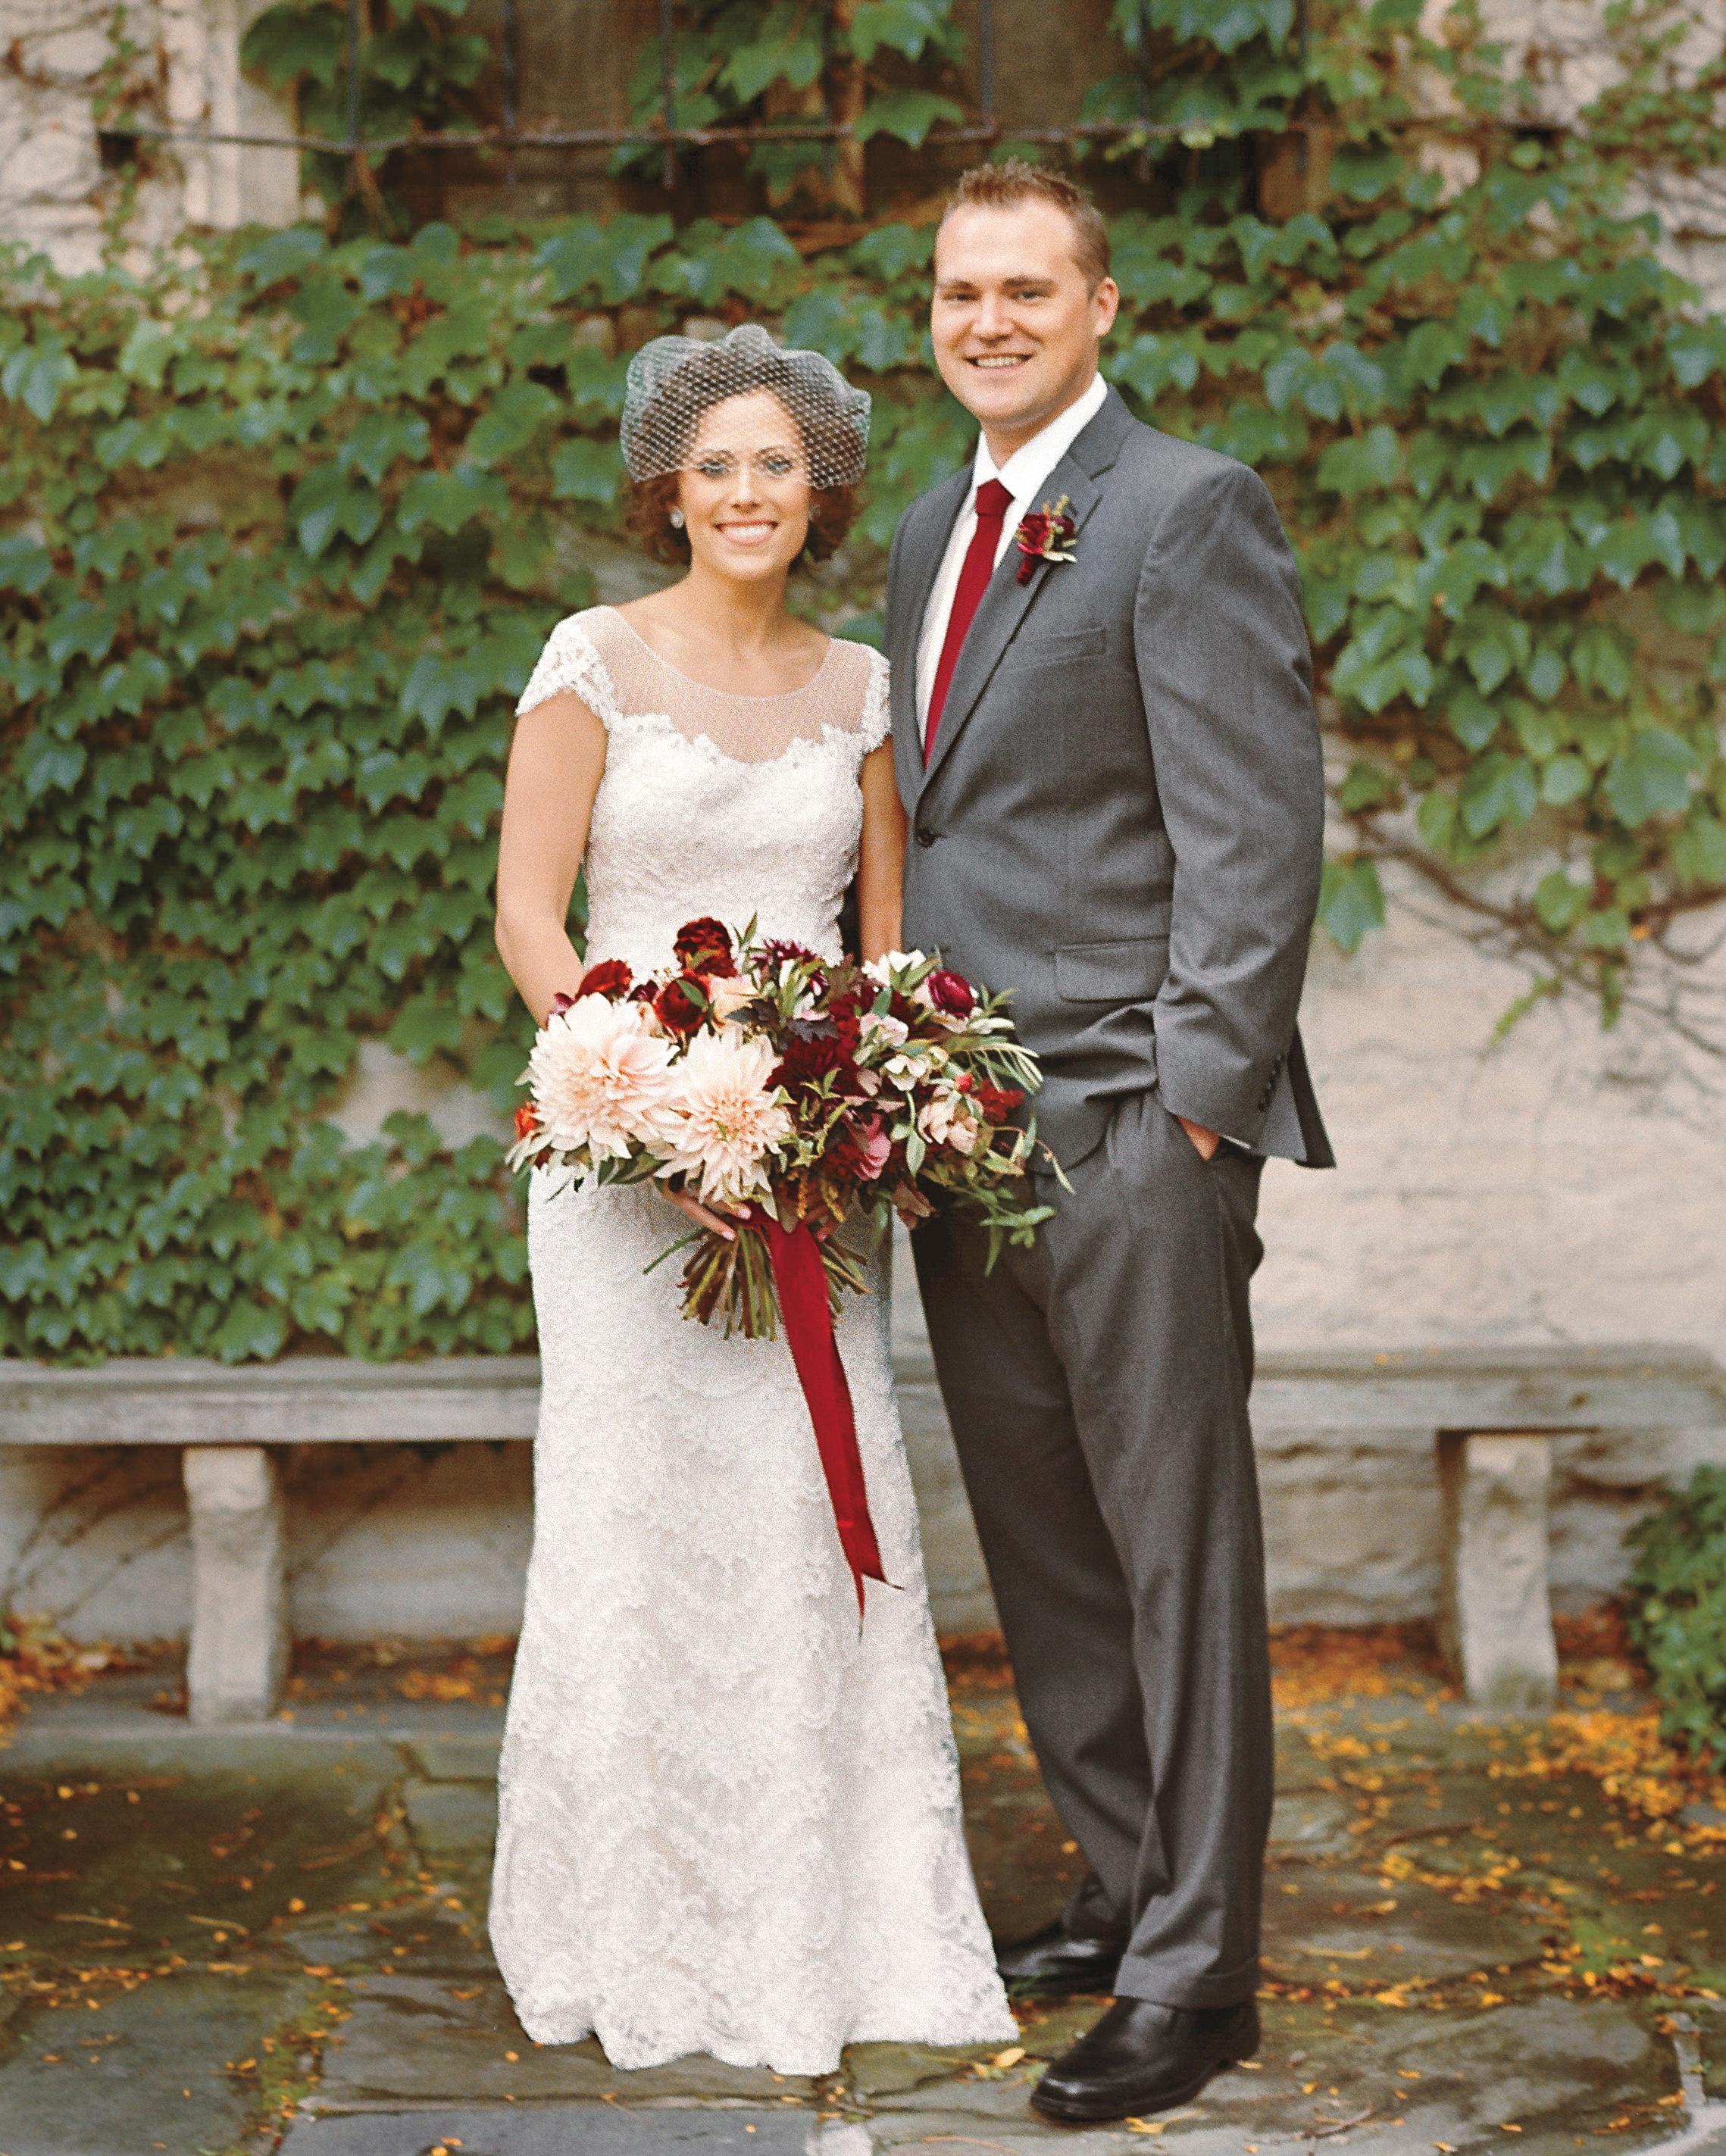 alix-bill-wedding-525-9096-07-2014-32-xl-d111617.jpg